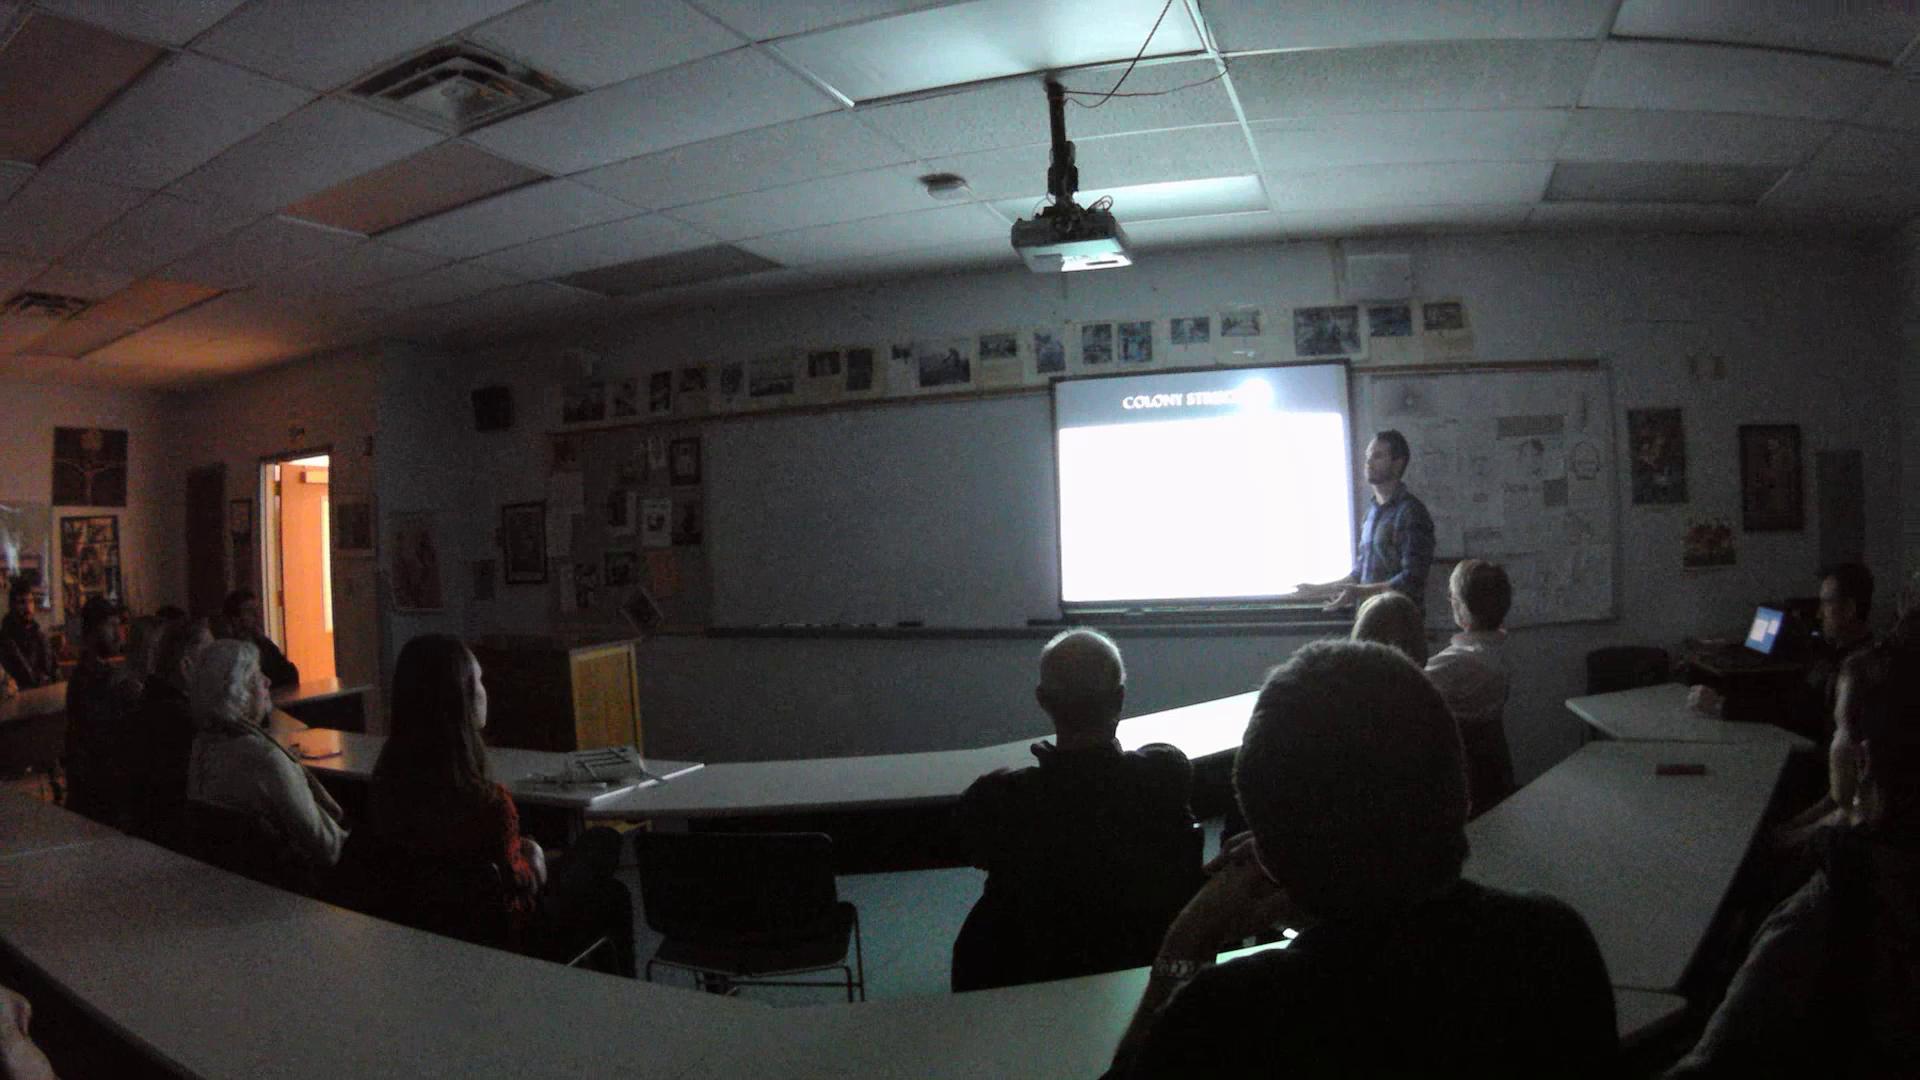 December 2014 public lecture at St. Louis University High School